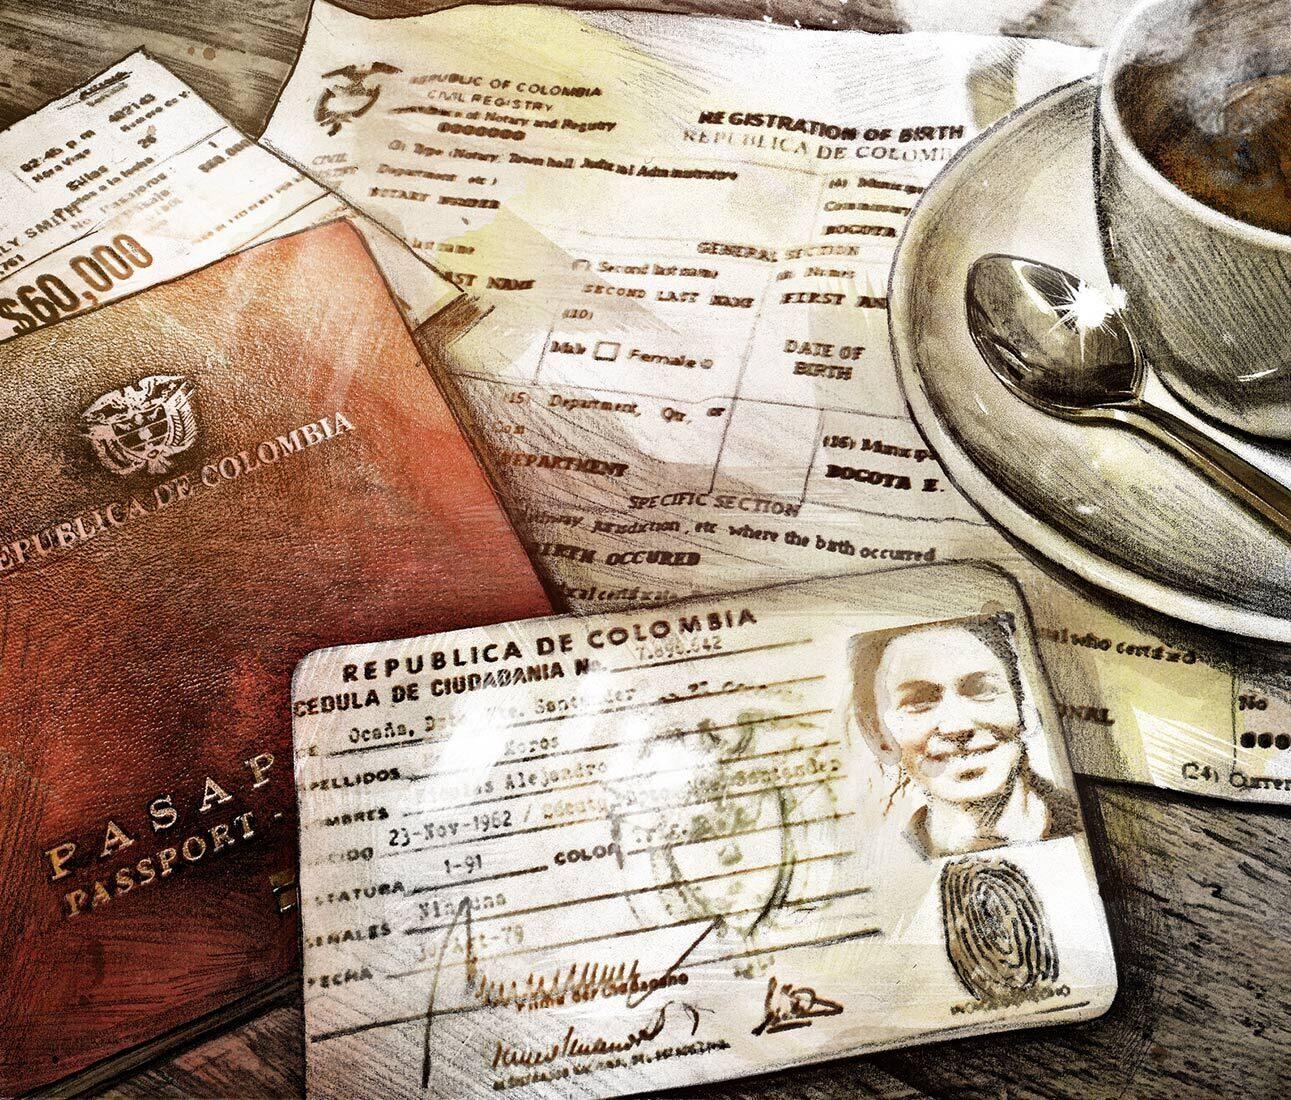 Passport travel illustration roots reserch - Kornel Illustration | Kornel Stadler portfolio